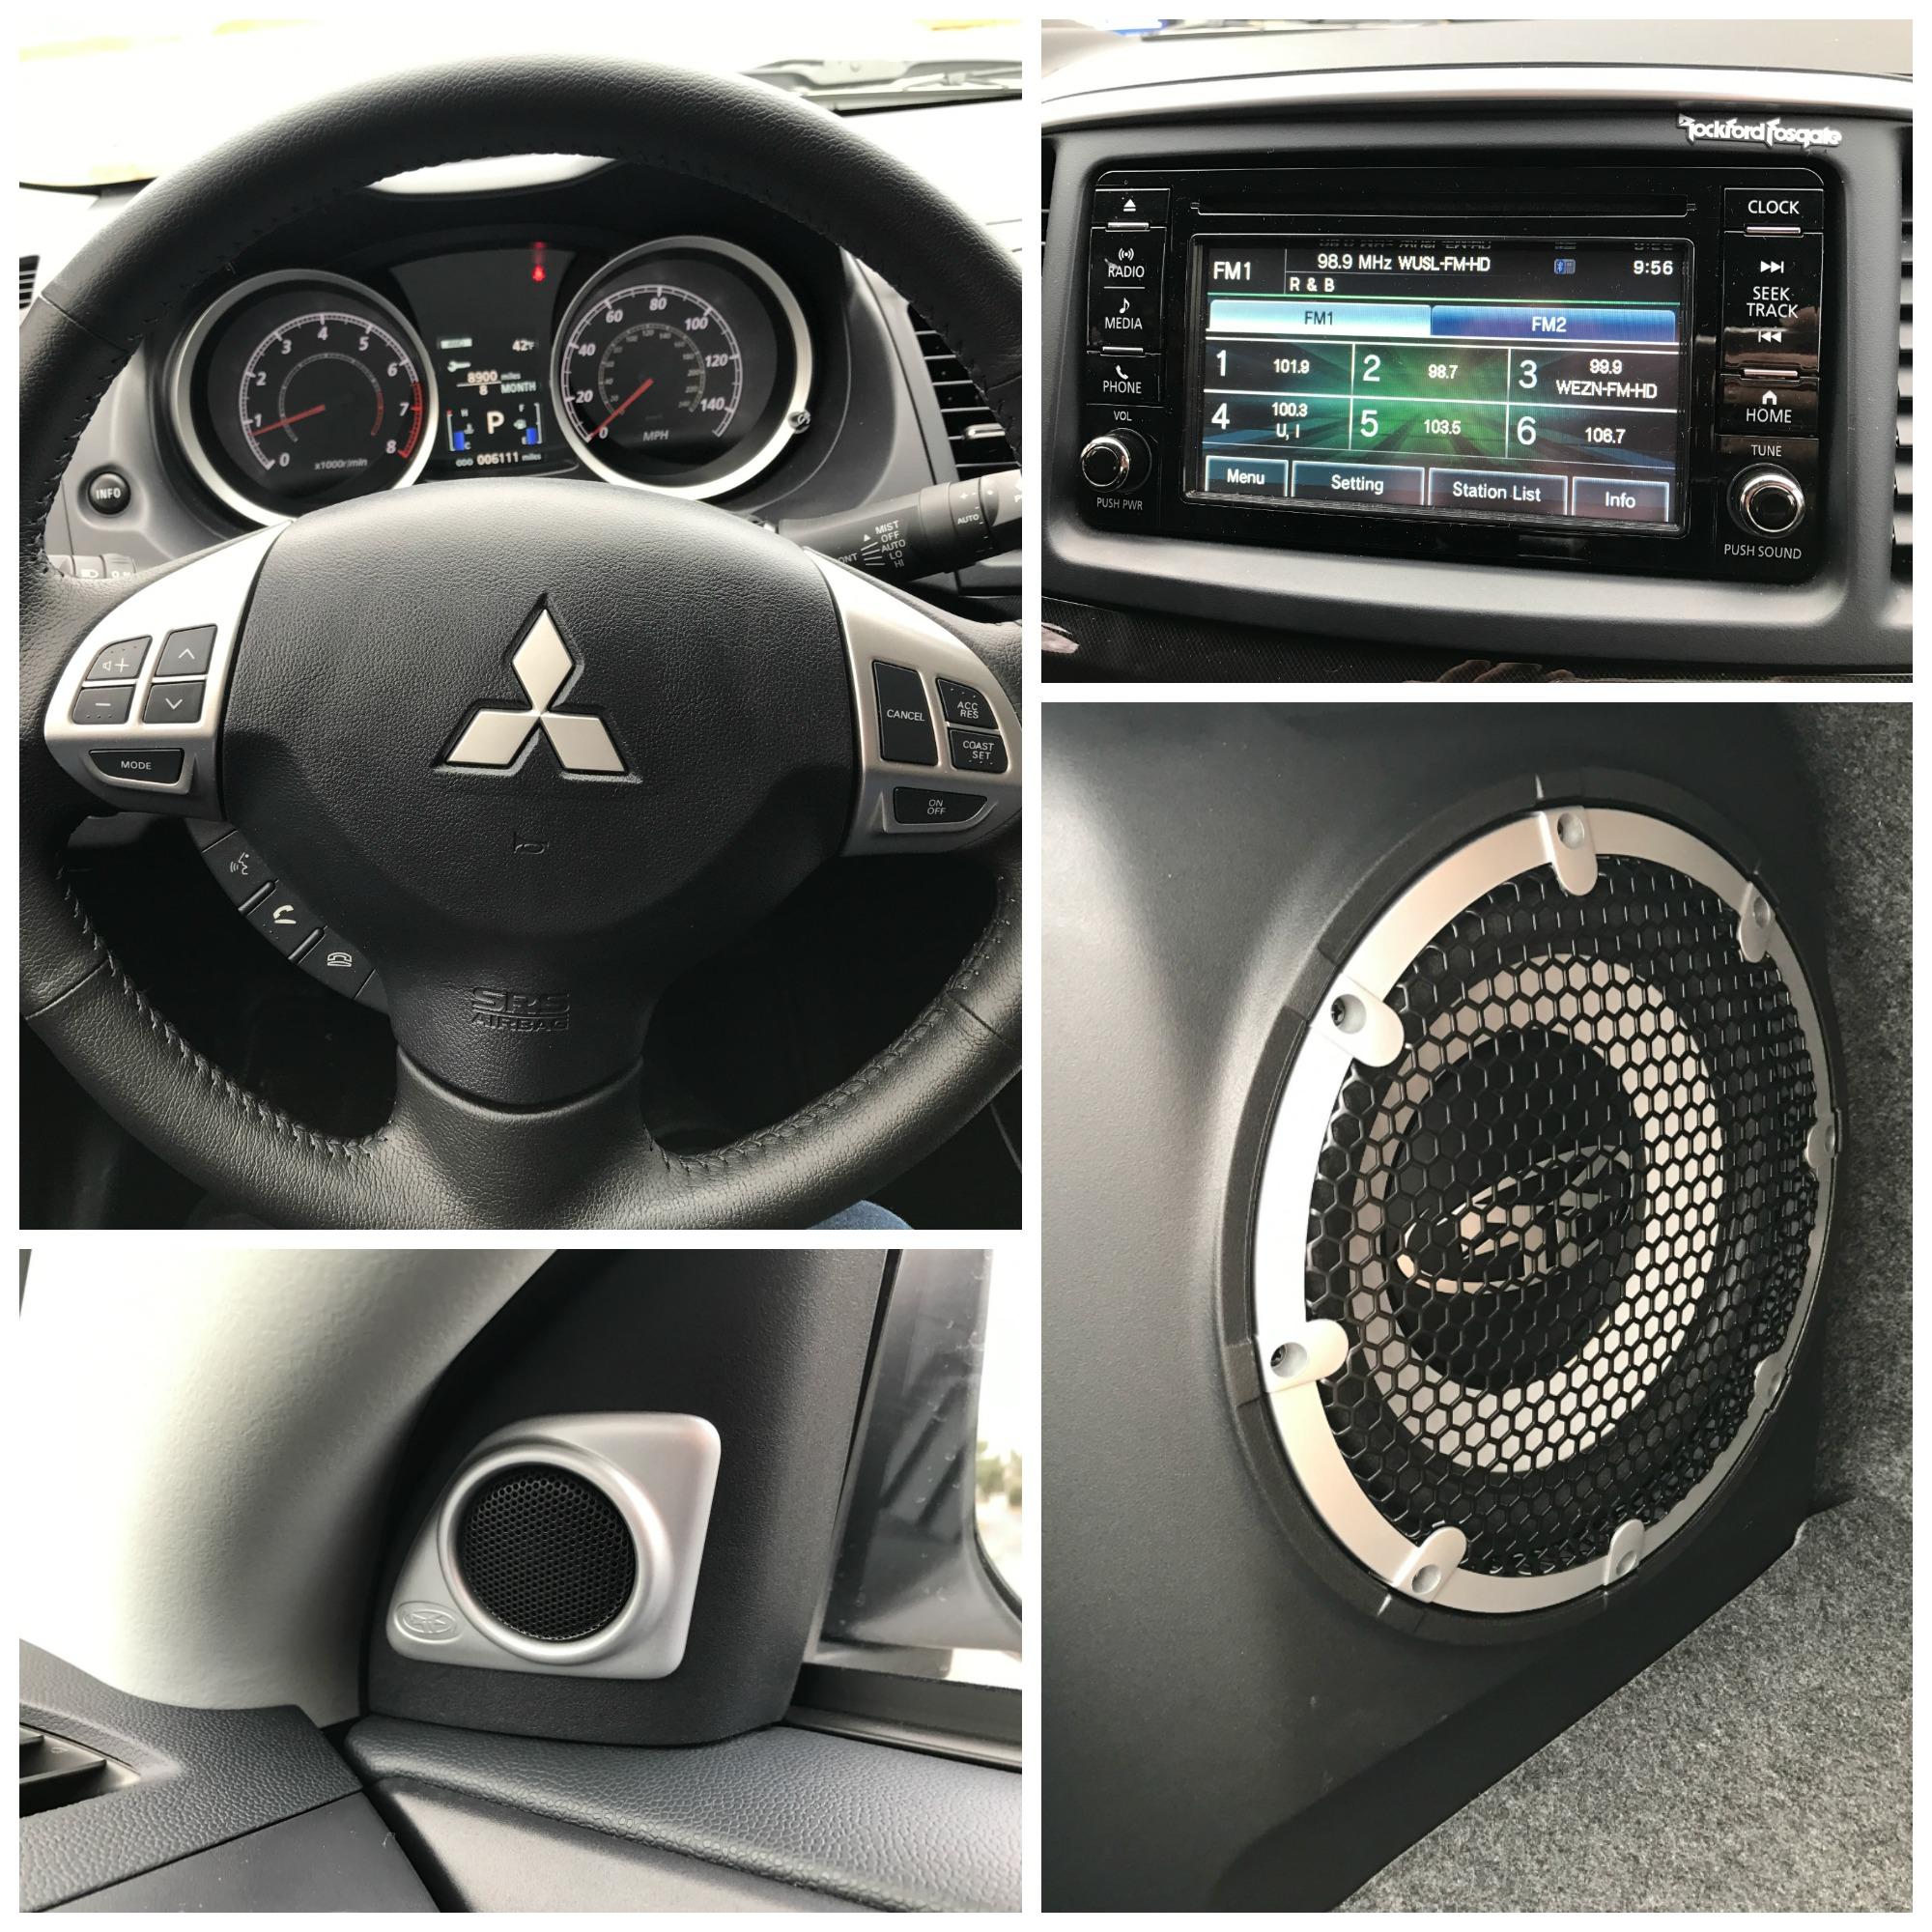 Take a Ride in the 2017 Mitsubishi Lancer SEL AWC